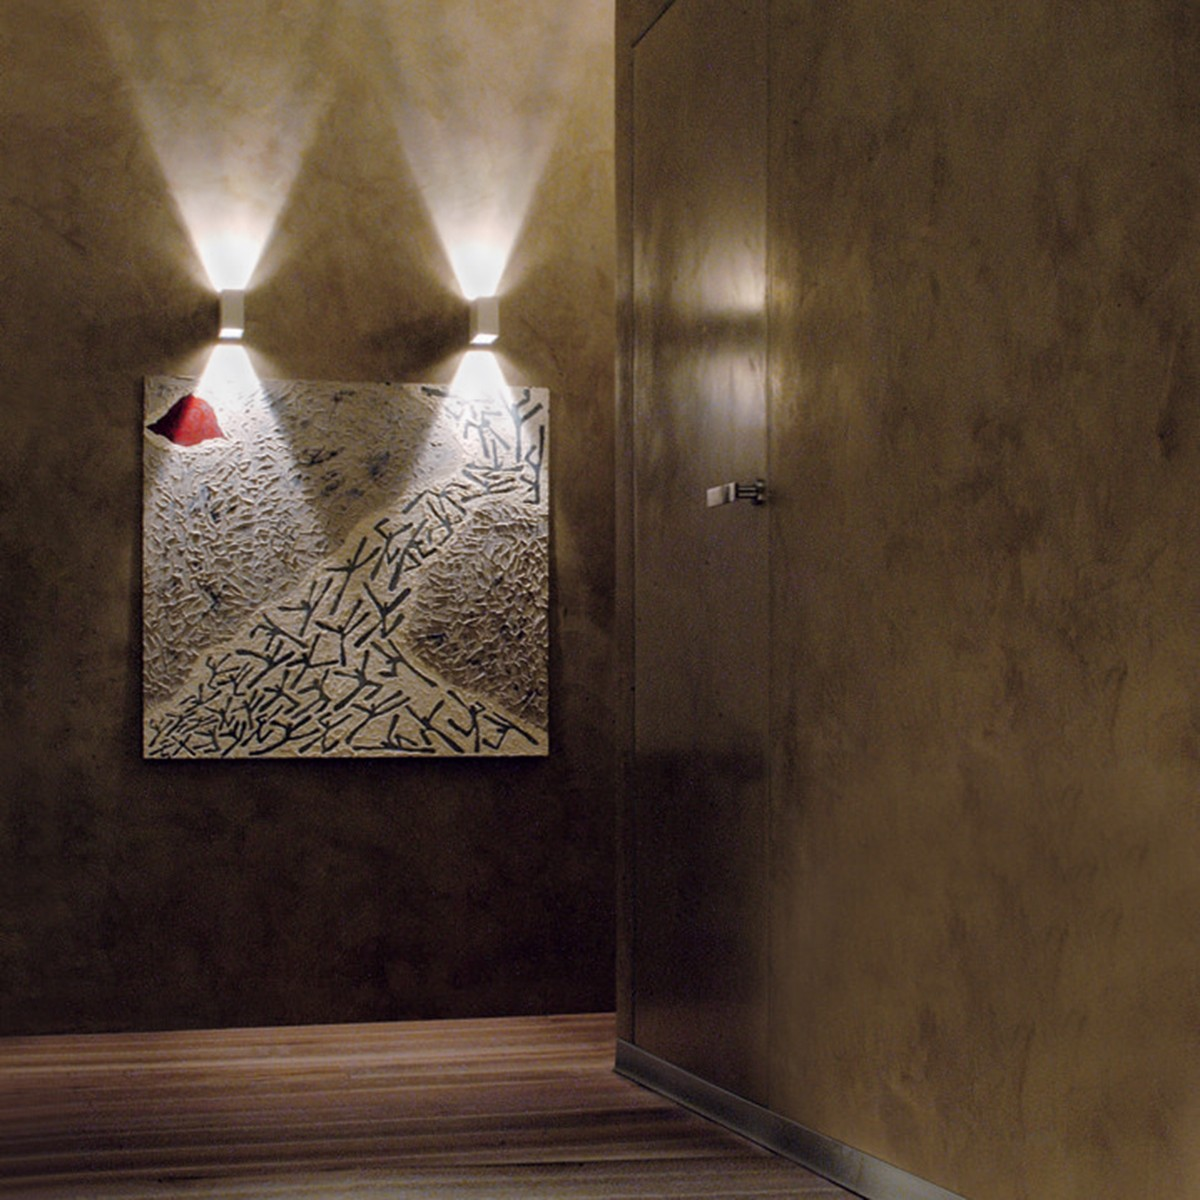 Studio Italia Design Laser Cube 10 x 6 LED Wandleuchte, 2700° K, weiß matt